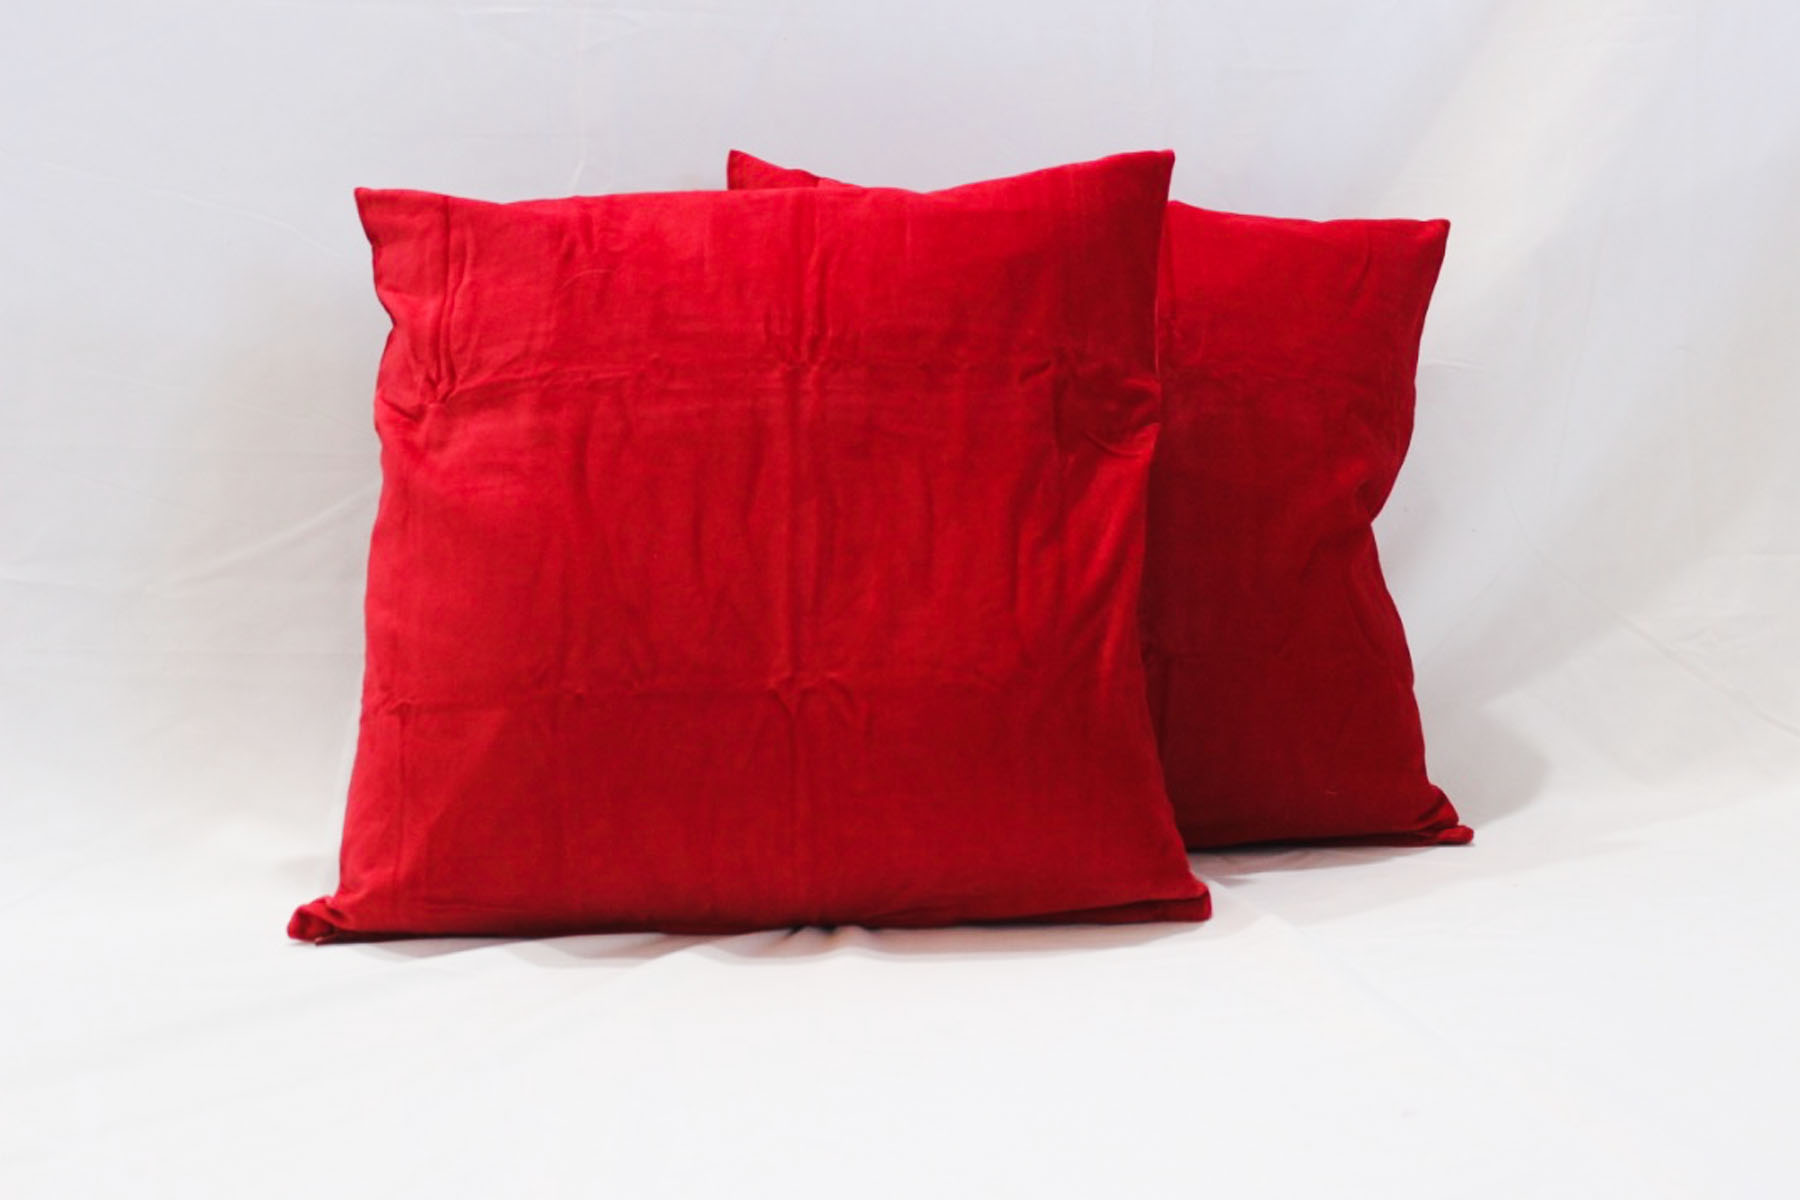 Red Velvet Pillows - Scavenged Vintage Rentals